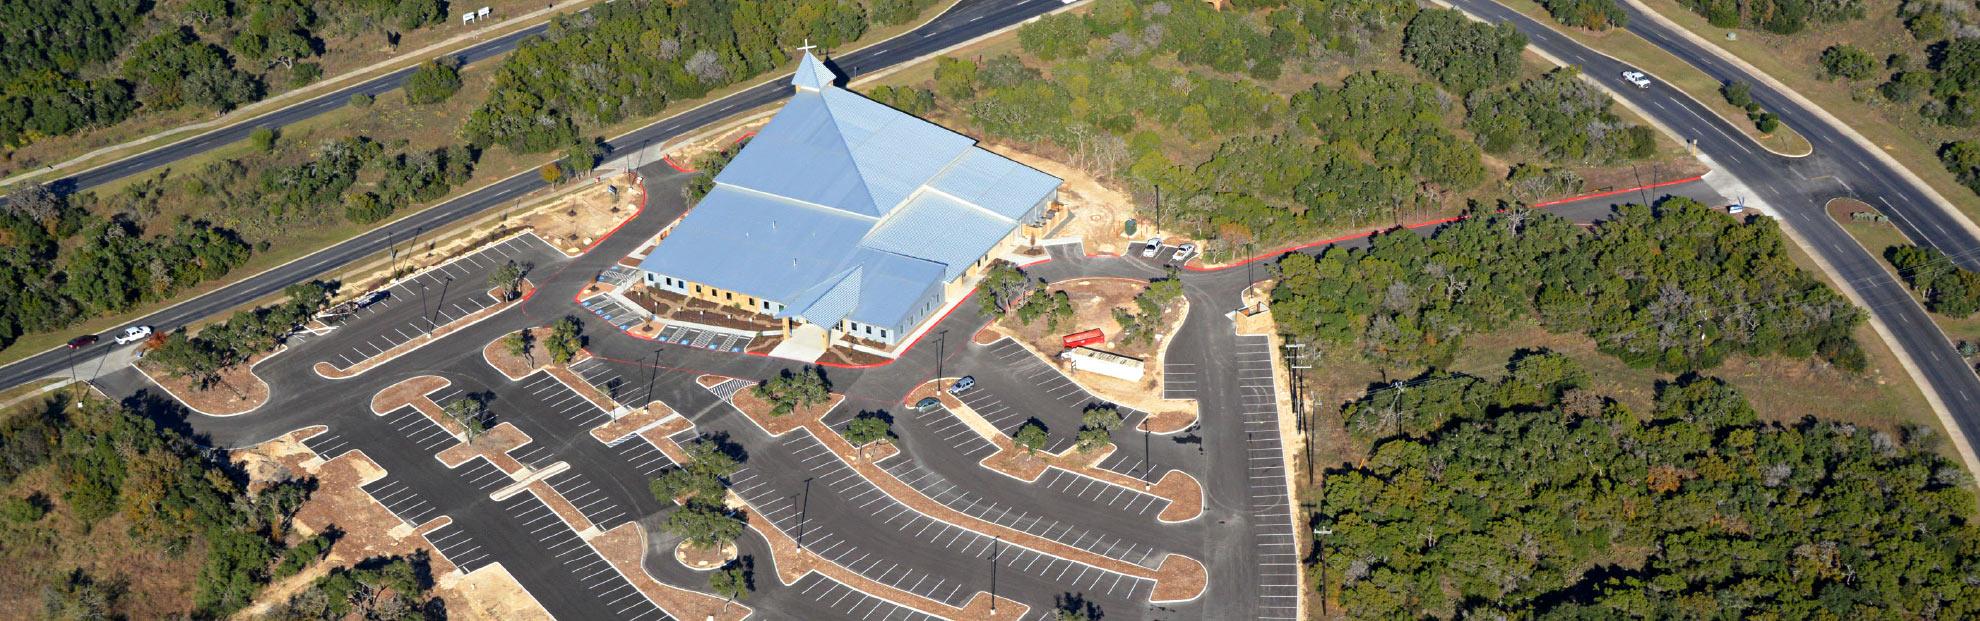 Church Design Build Top Image